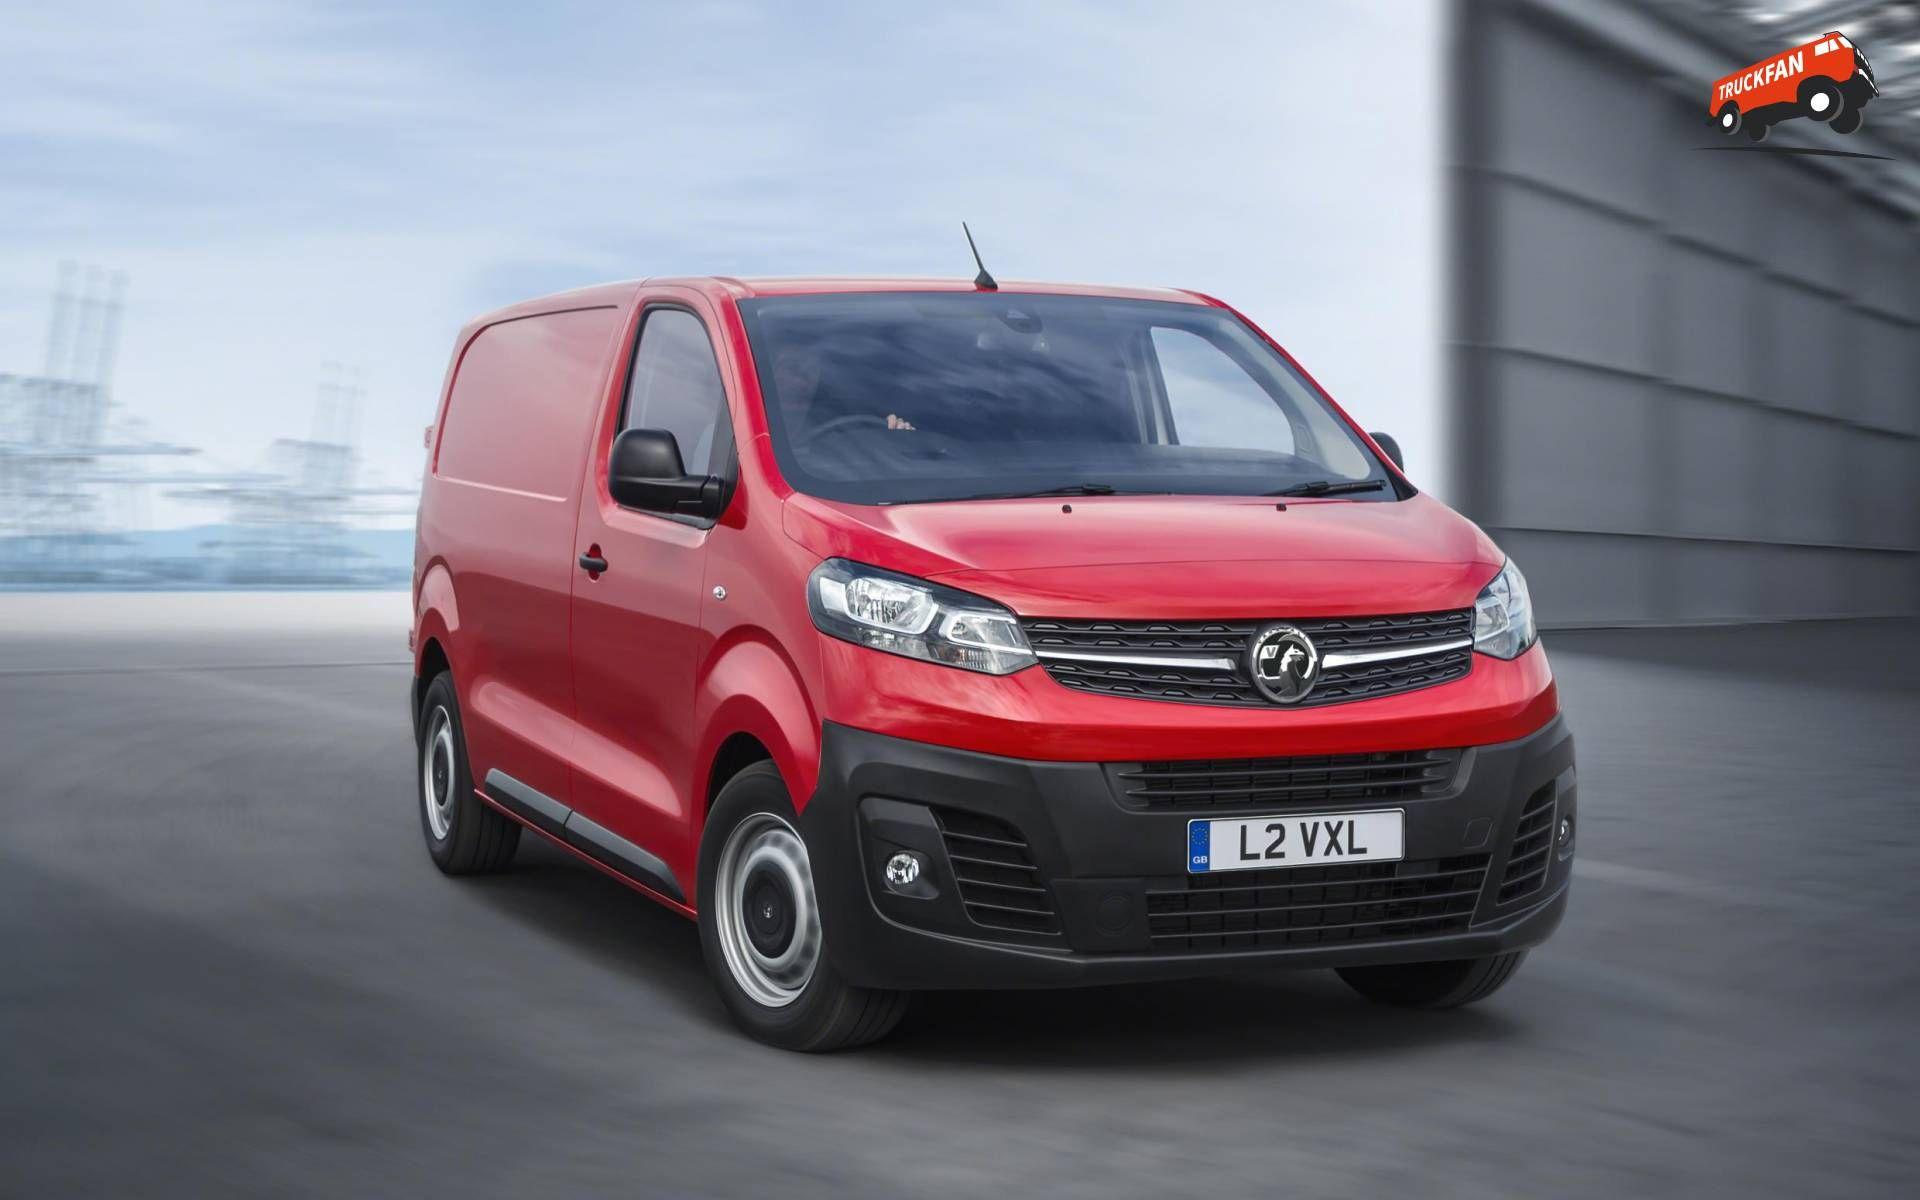 neuer opel vivaro 2020 changes | vauxhall, opel, car review